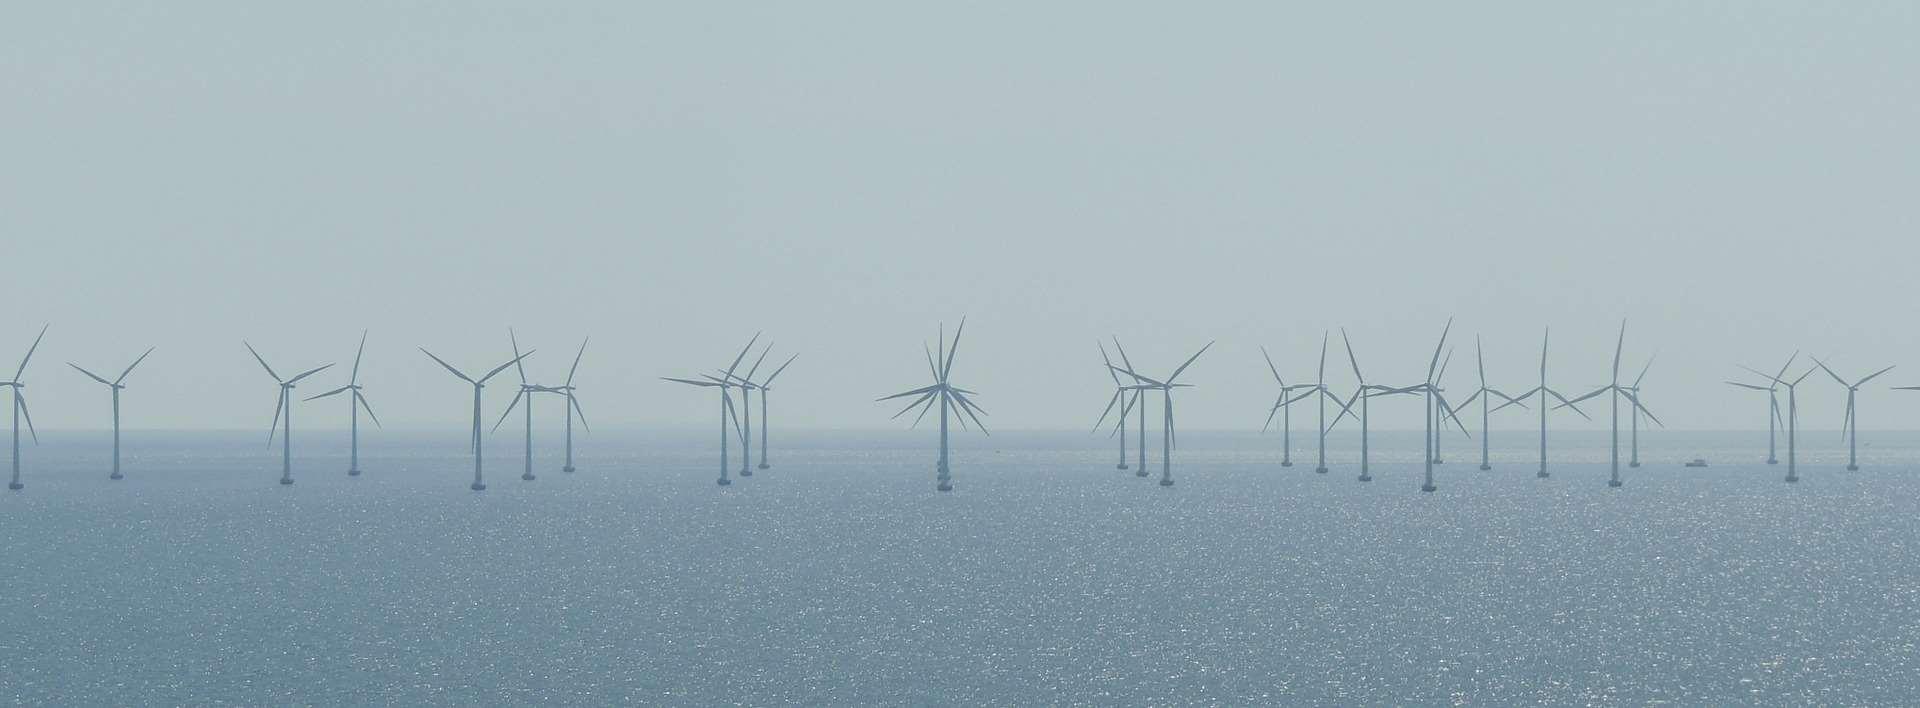 nacelle wind turbine